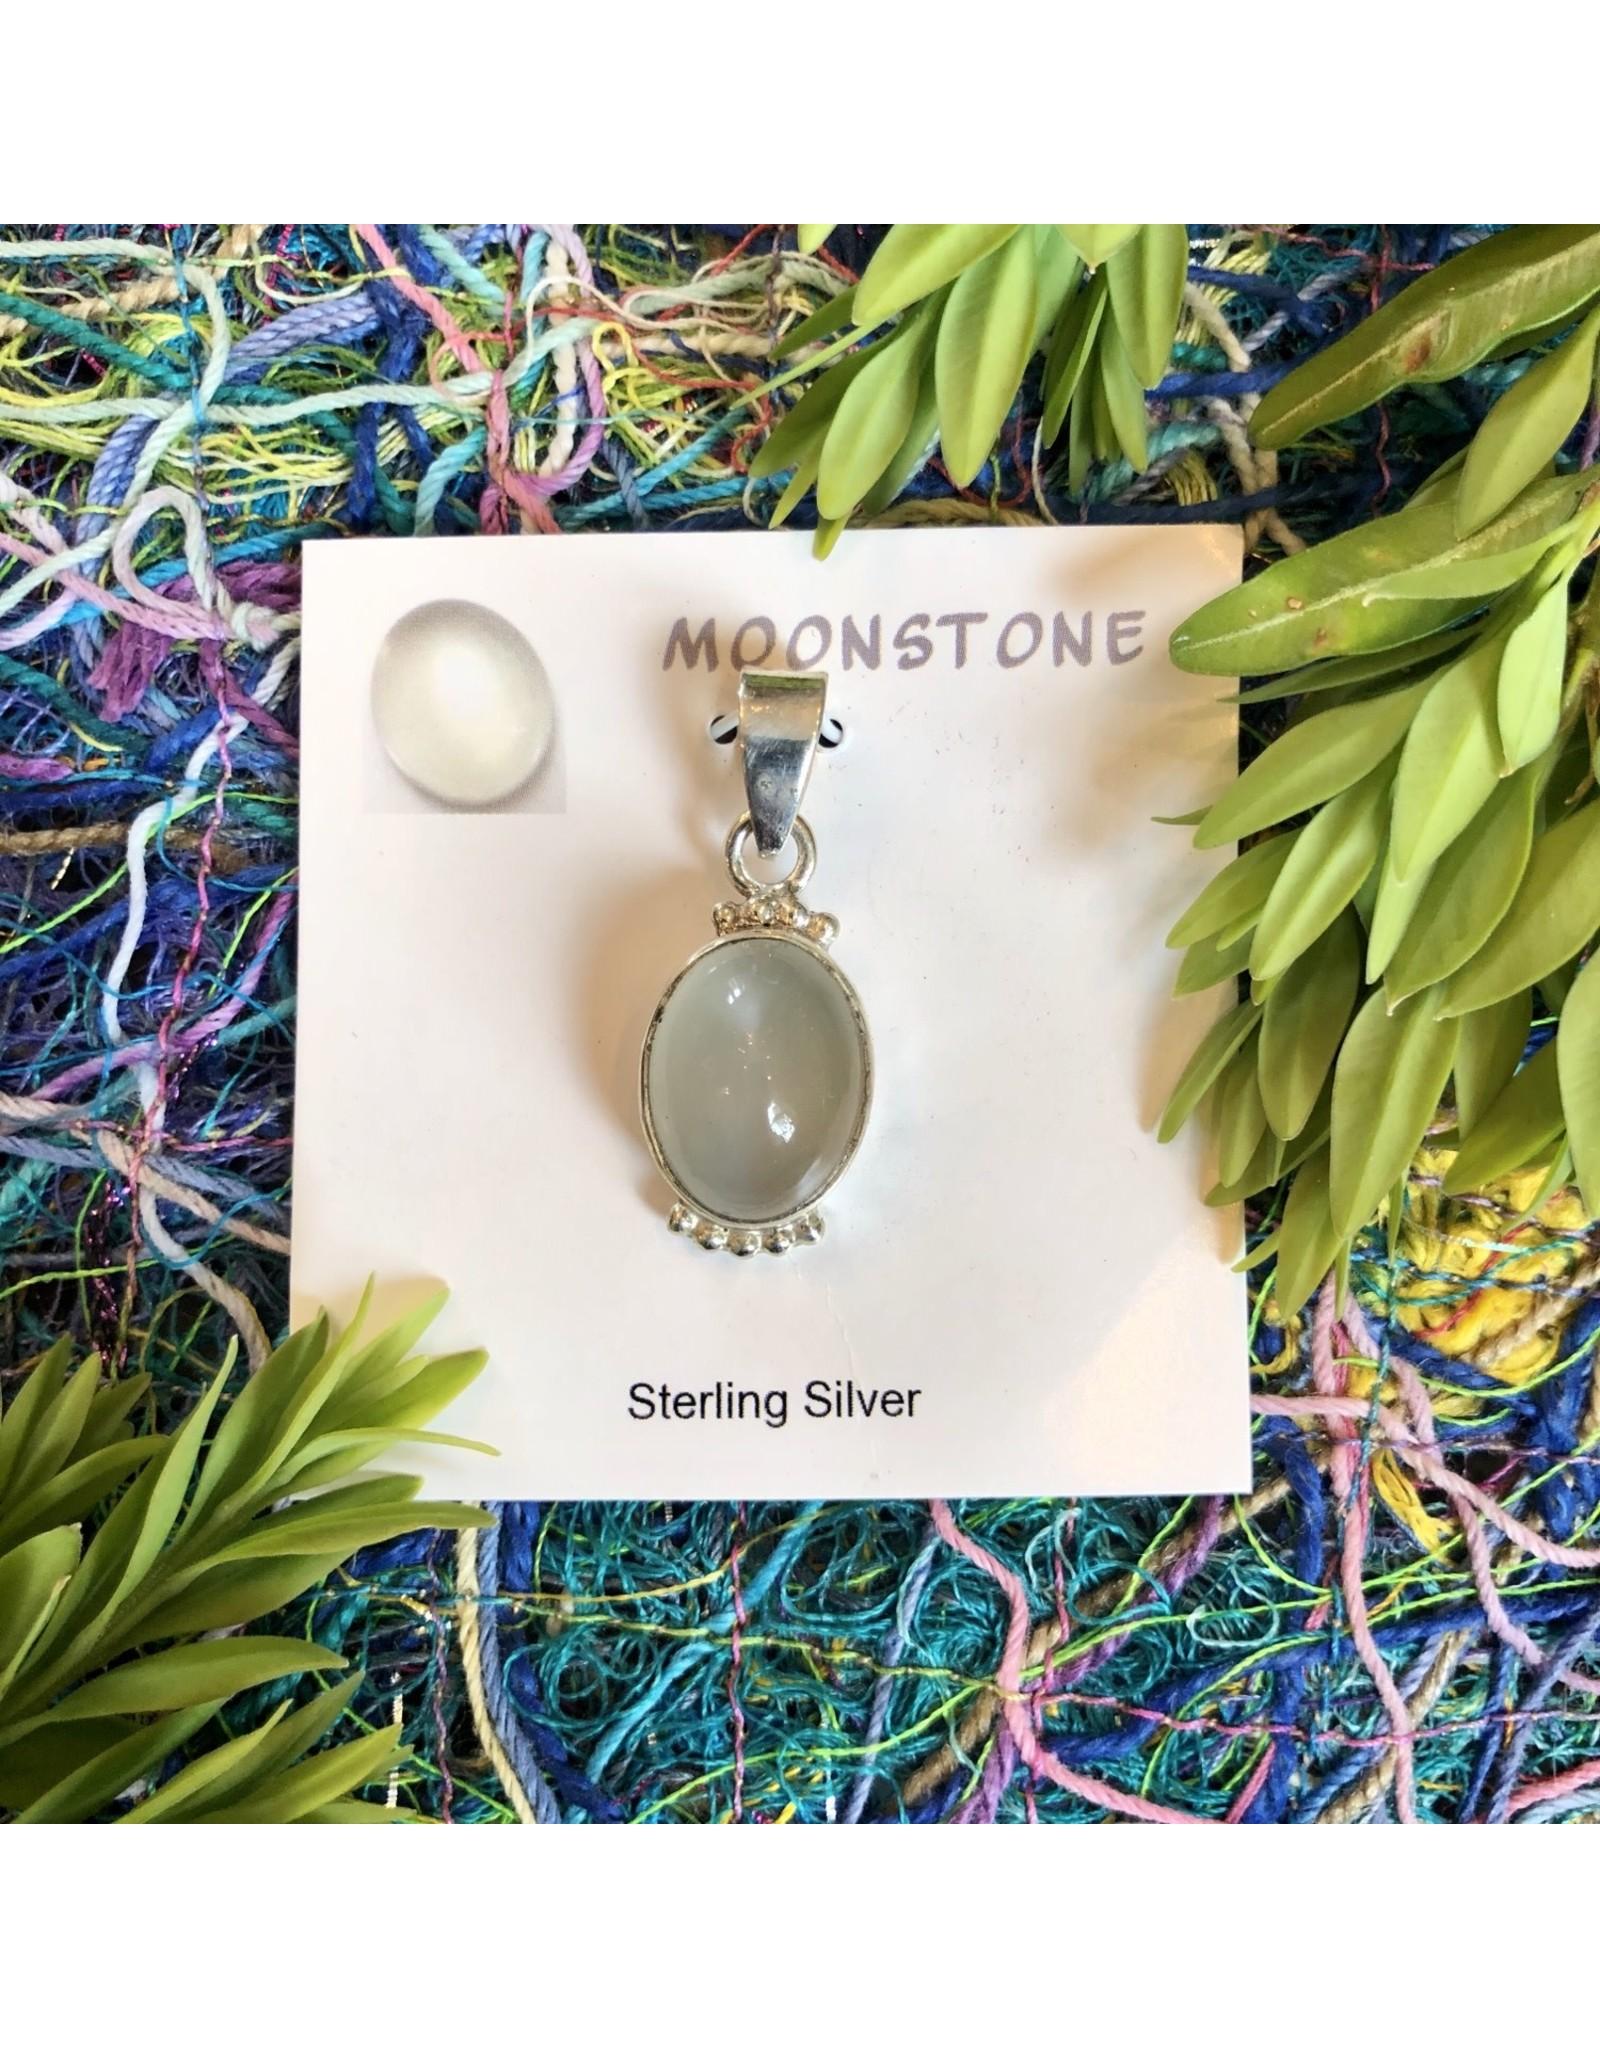 Sterling Silver Gemstone Pendant 29.99